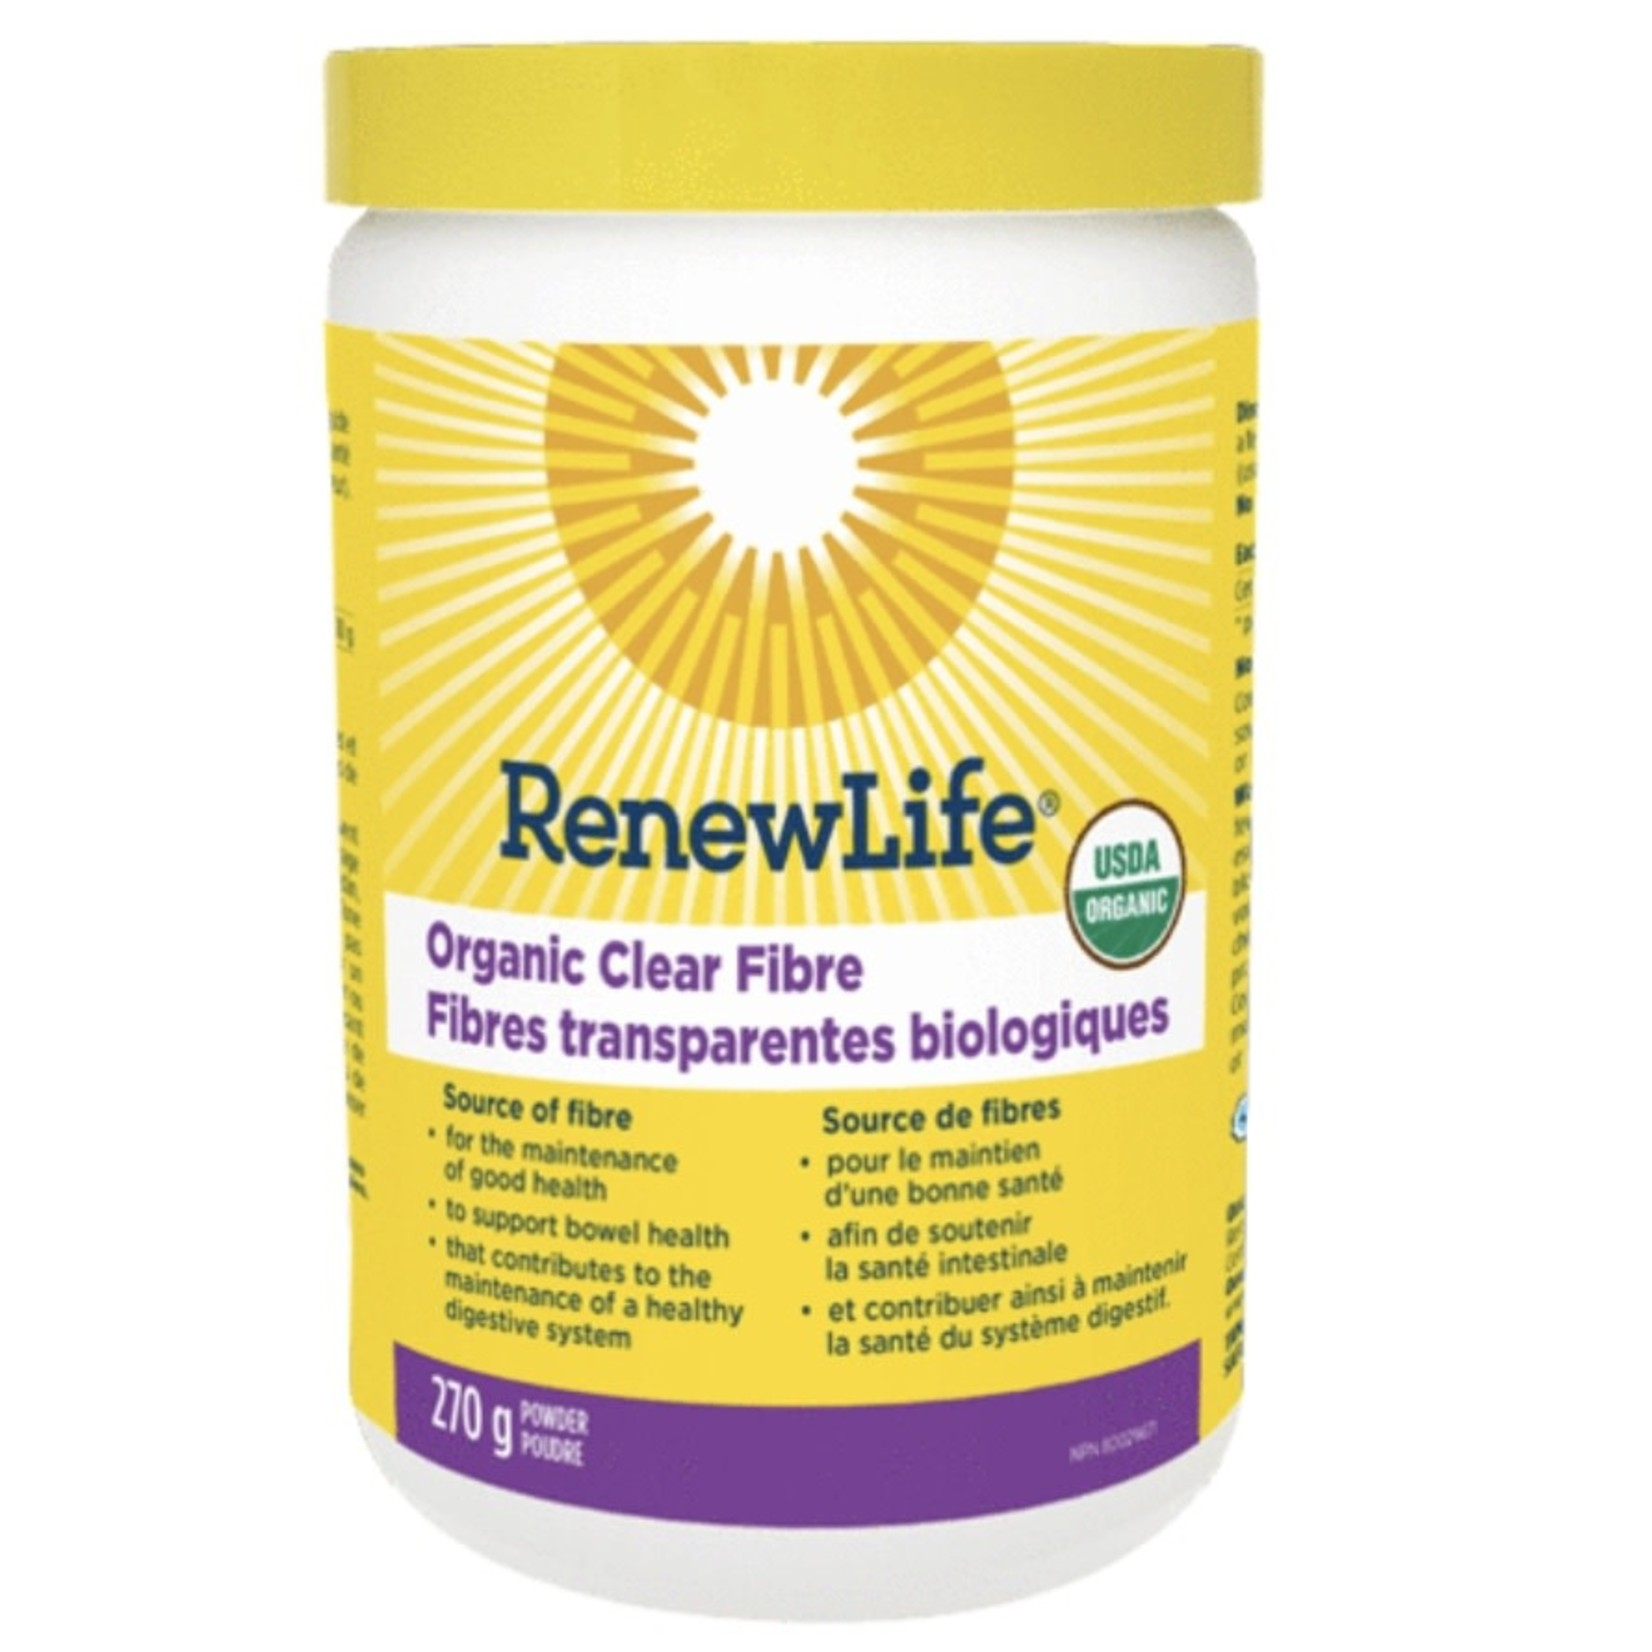 Renew Life Renew Life Organic Clear Fibre 270g